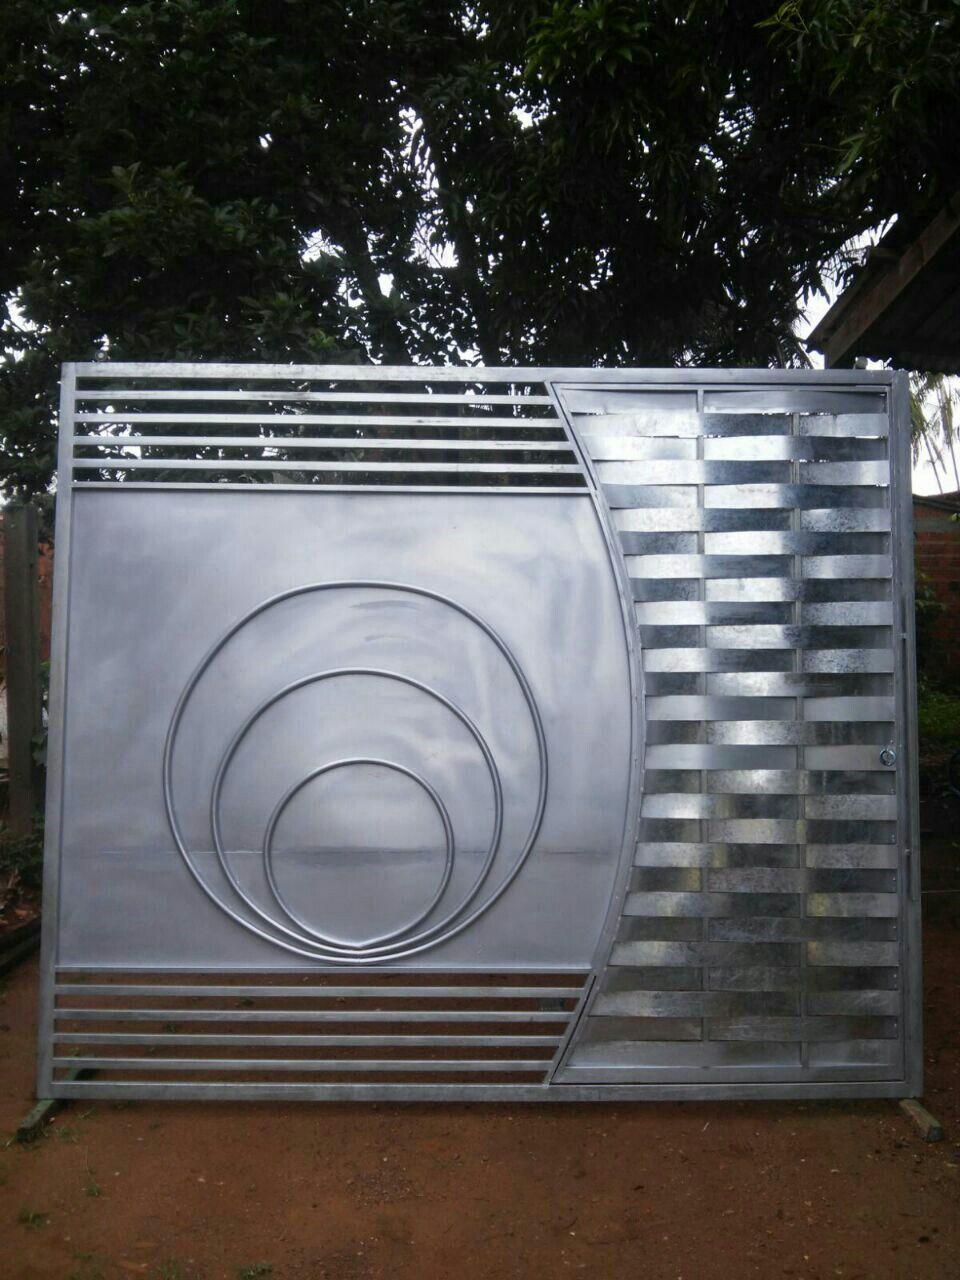 House window grill design 2018  gate ideas  welding ideas in   pinterest  gate design gate